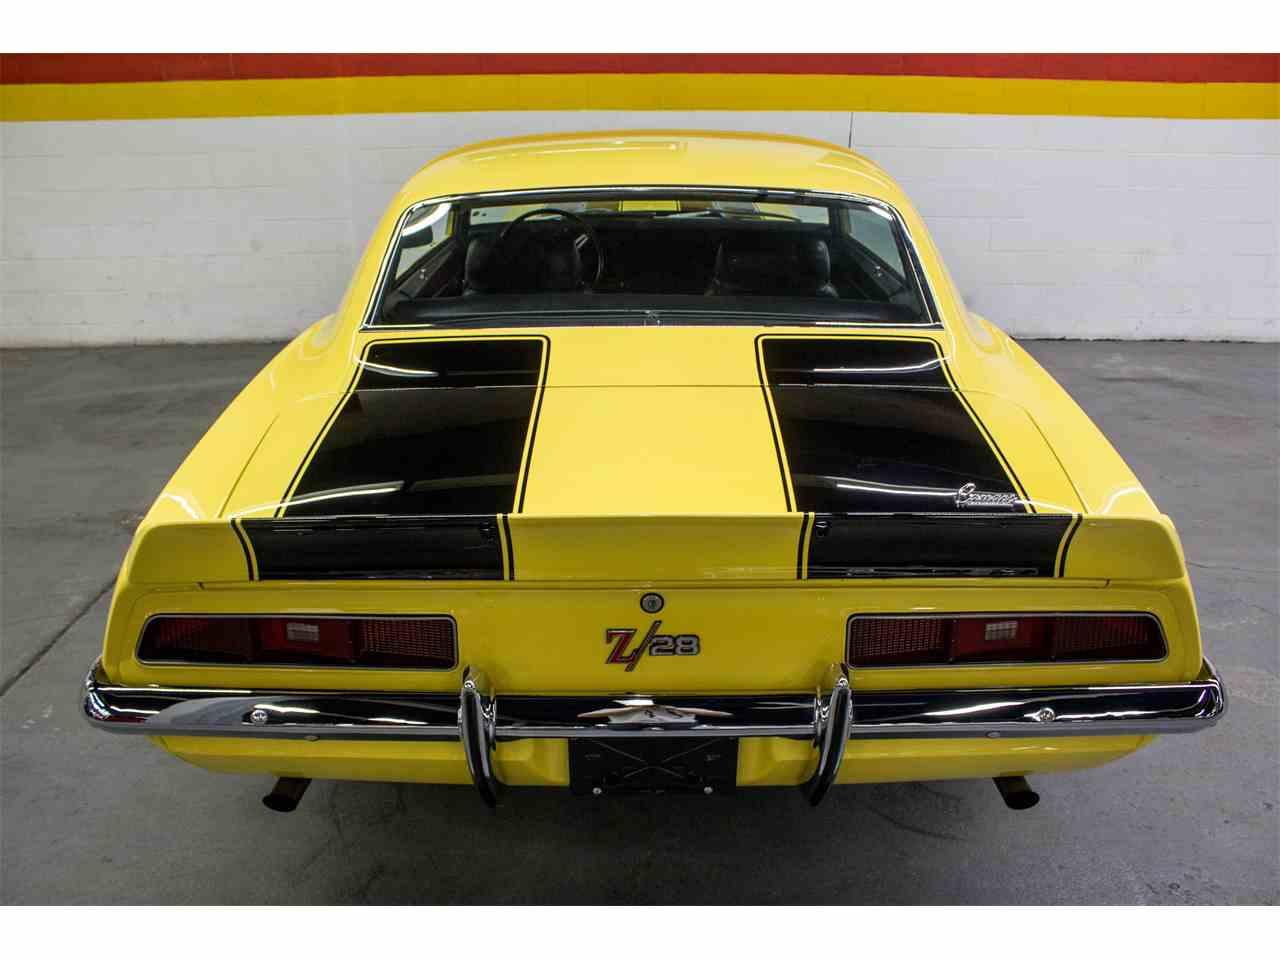 Large Picture of Classic '69 Chevrolet Camaro Z28 located in Quebec - $79,000.00 - M8KS